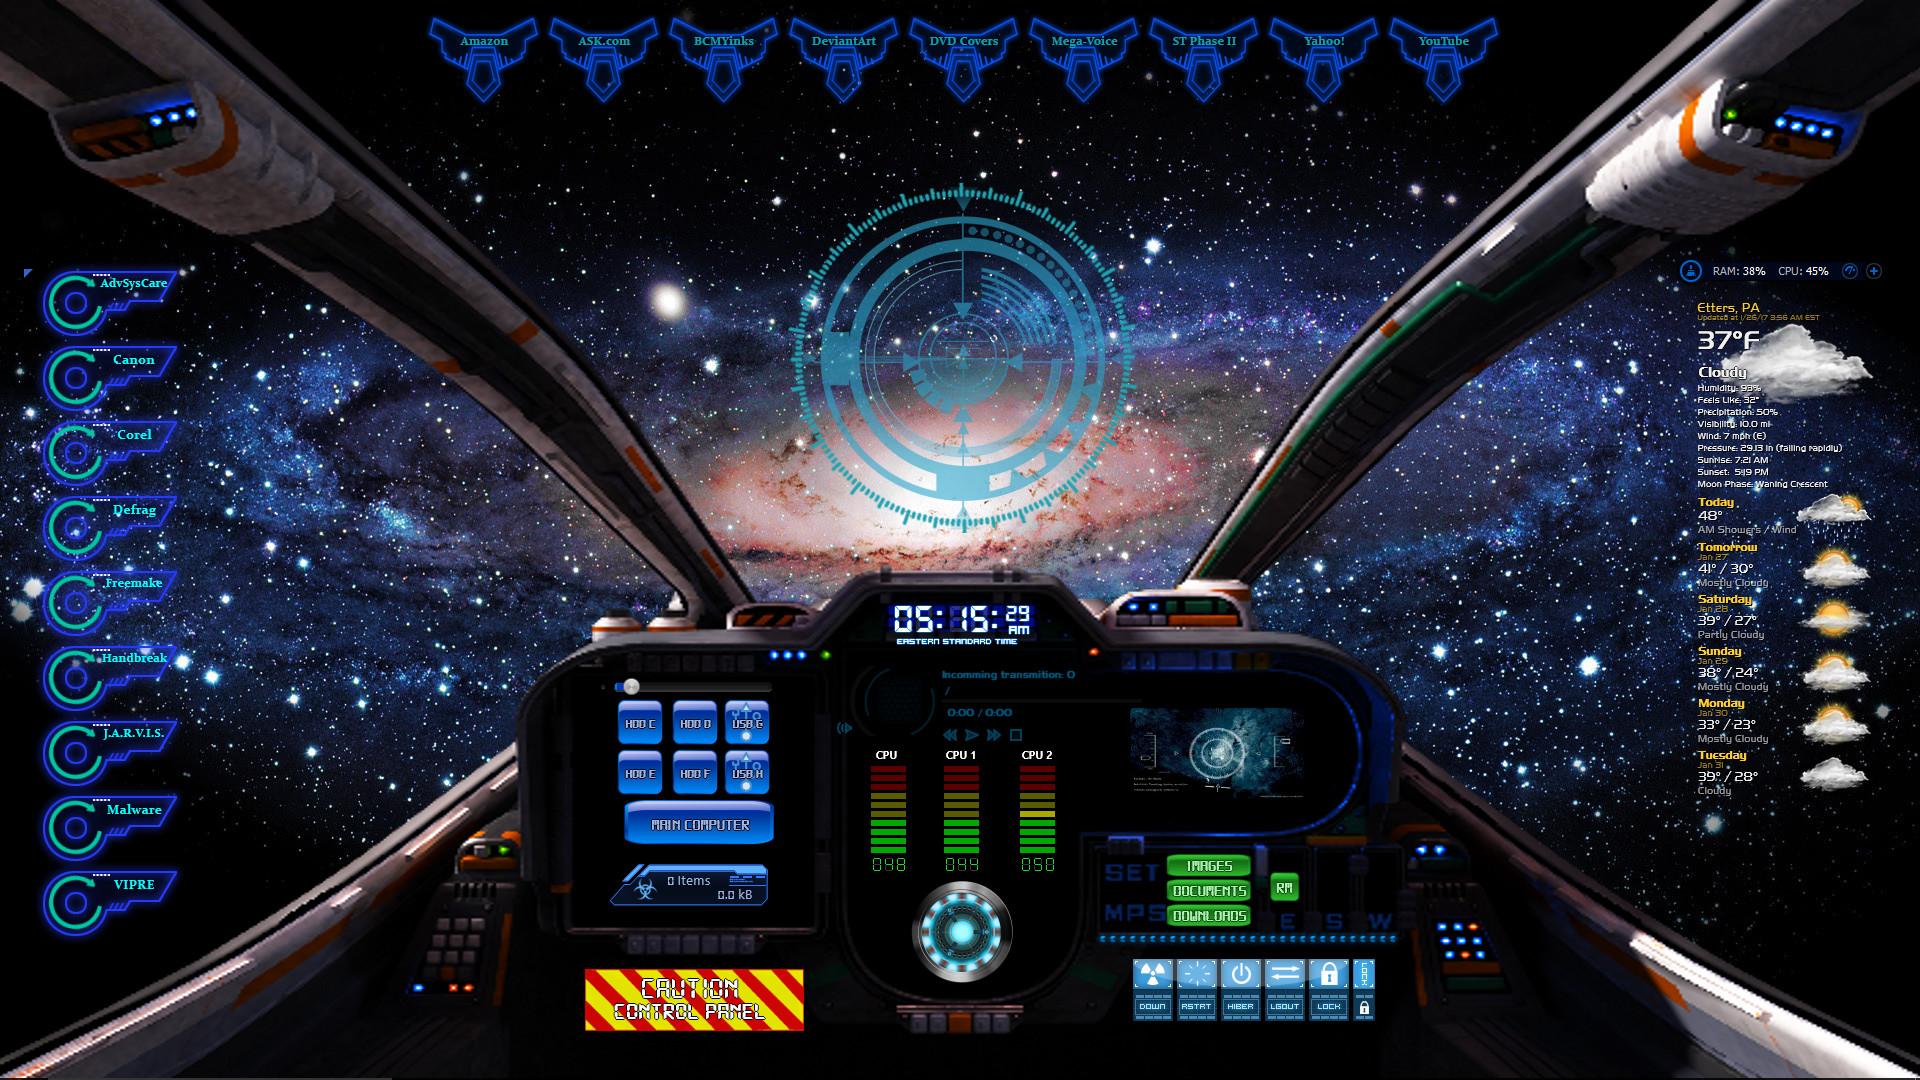 Spaceship Cockpit by oldcrow10 on DeviantArt